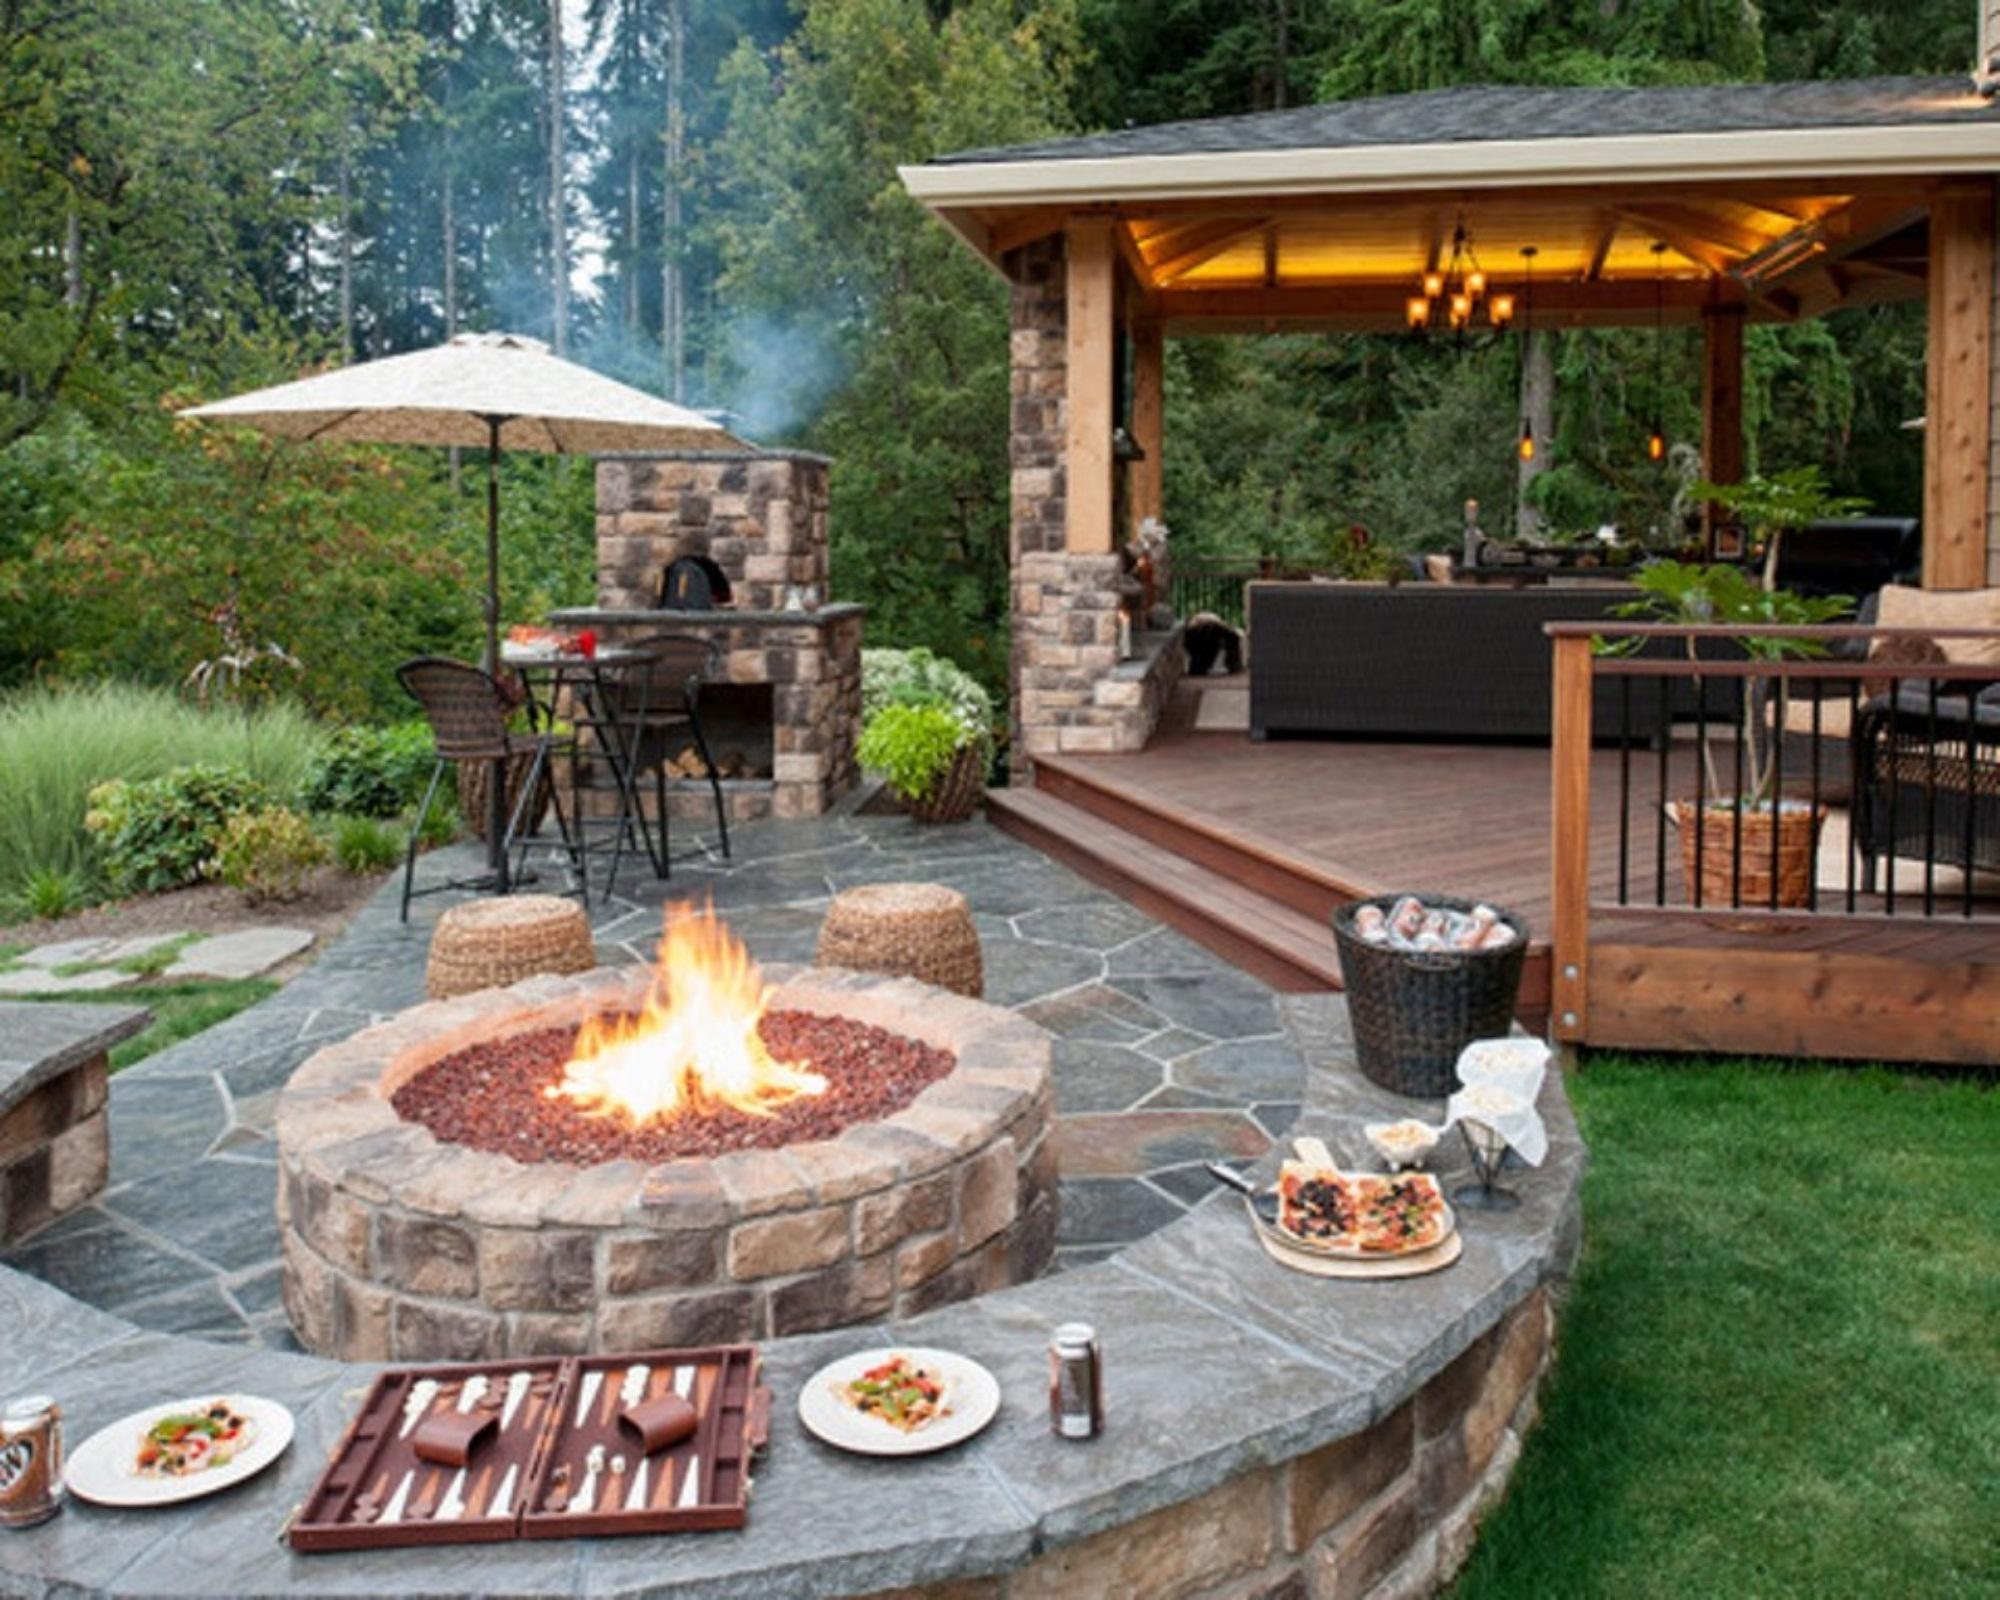 backyard patios amazing patios and decks for small backyards images inspiration for backyard LJXSUKY